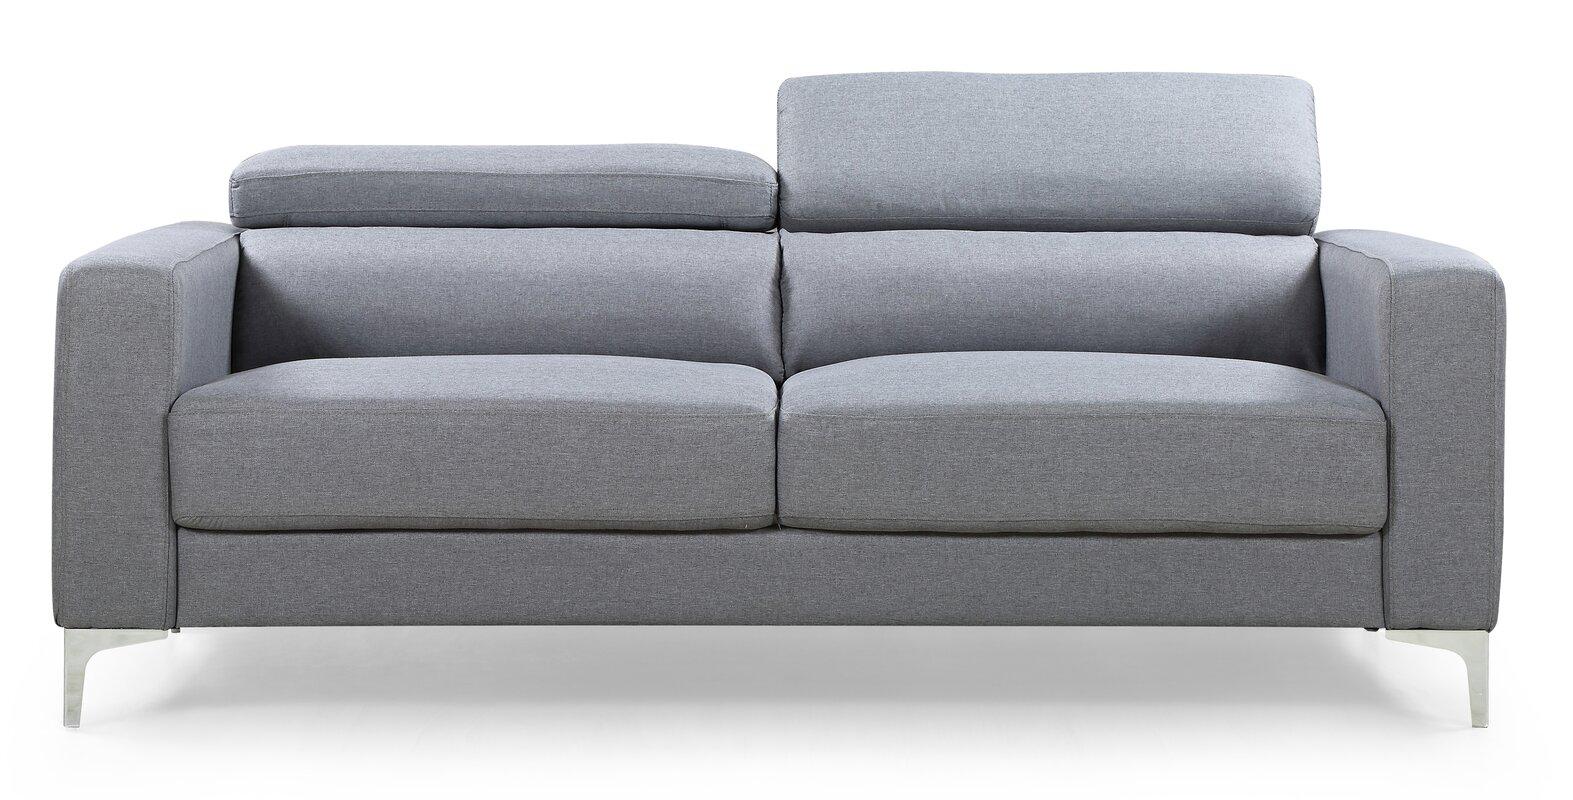 George Oliver Dennis Modern Sofa Amp Reviews Wayfair Ca